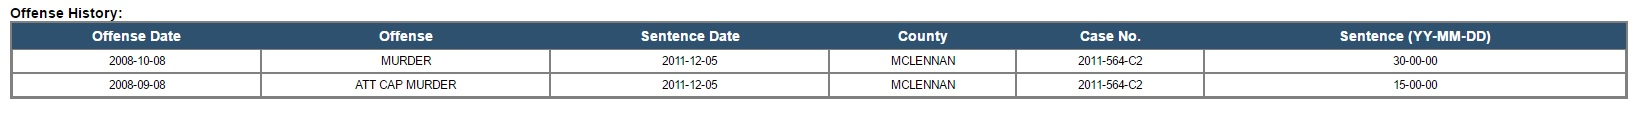 "sturdivant dating Knox, david, vivian daniels, lakisha sturdivant, and marty e zusman 2000 ""college student use of the internet for mate selection"" college student journal 35(1): 158-160 knox, david, leonard l custis, and marty e zusman 2000 ""abuse in dating relationships among college students"" college student journal 34(4): 505-509."